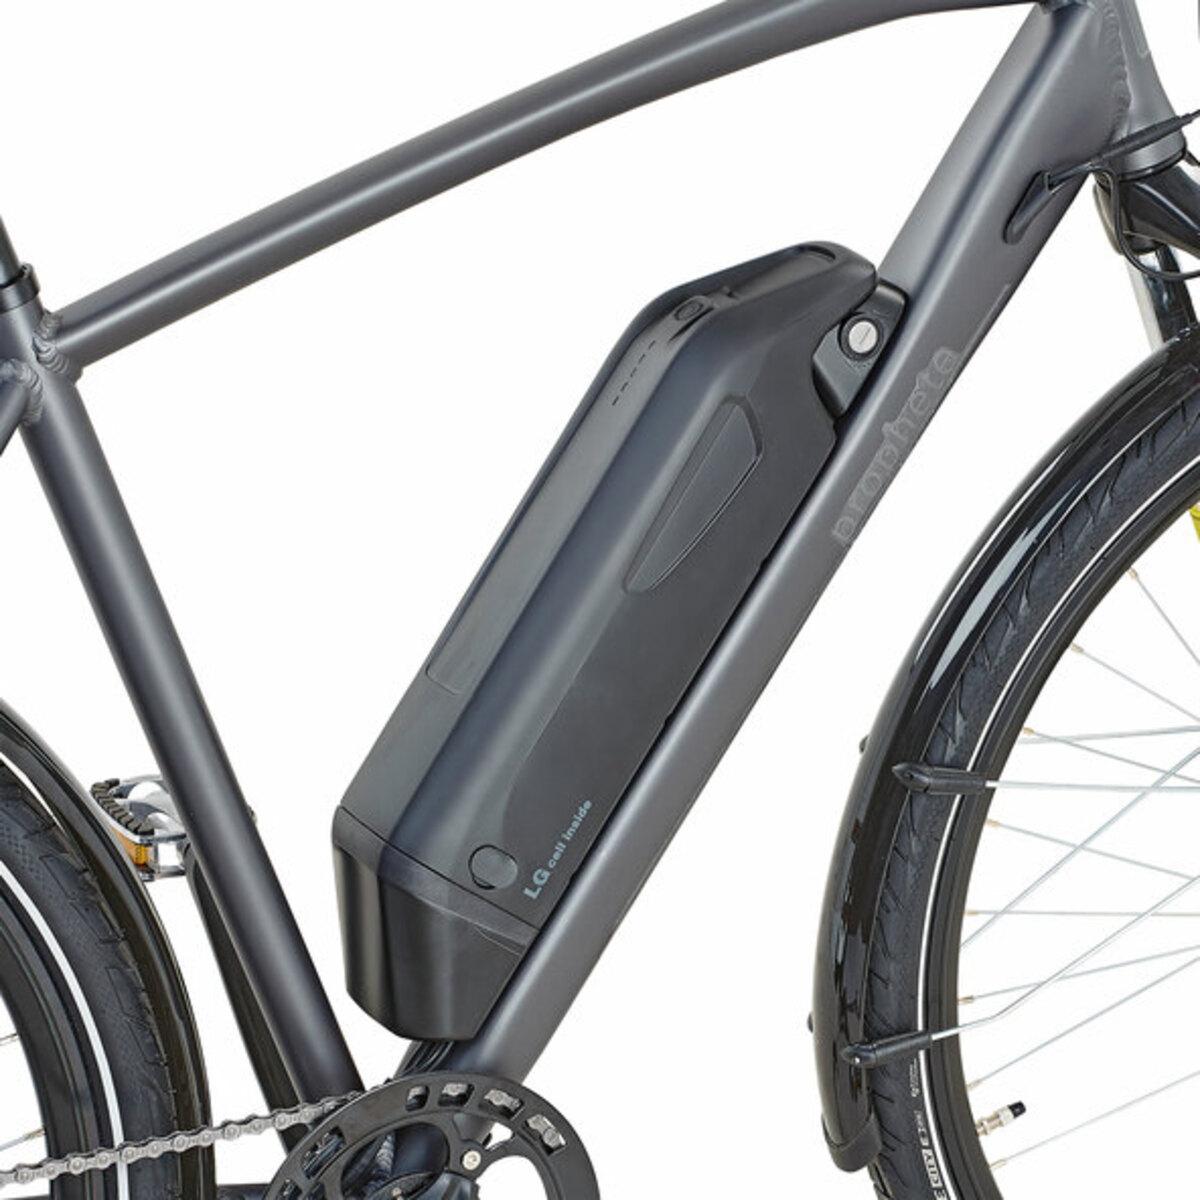 Bild 4 von Alu-Trekking-E-Bike 28″